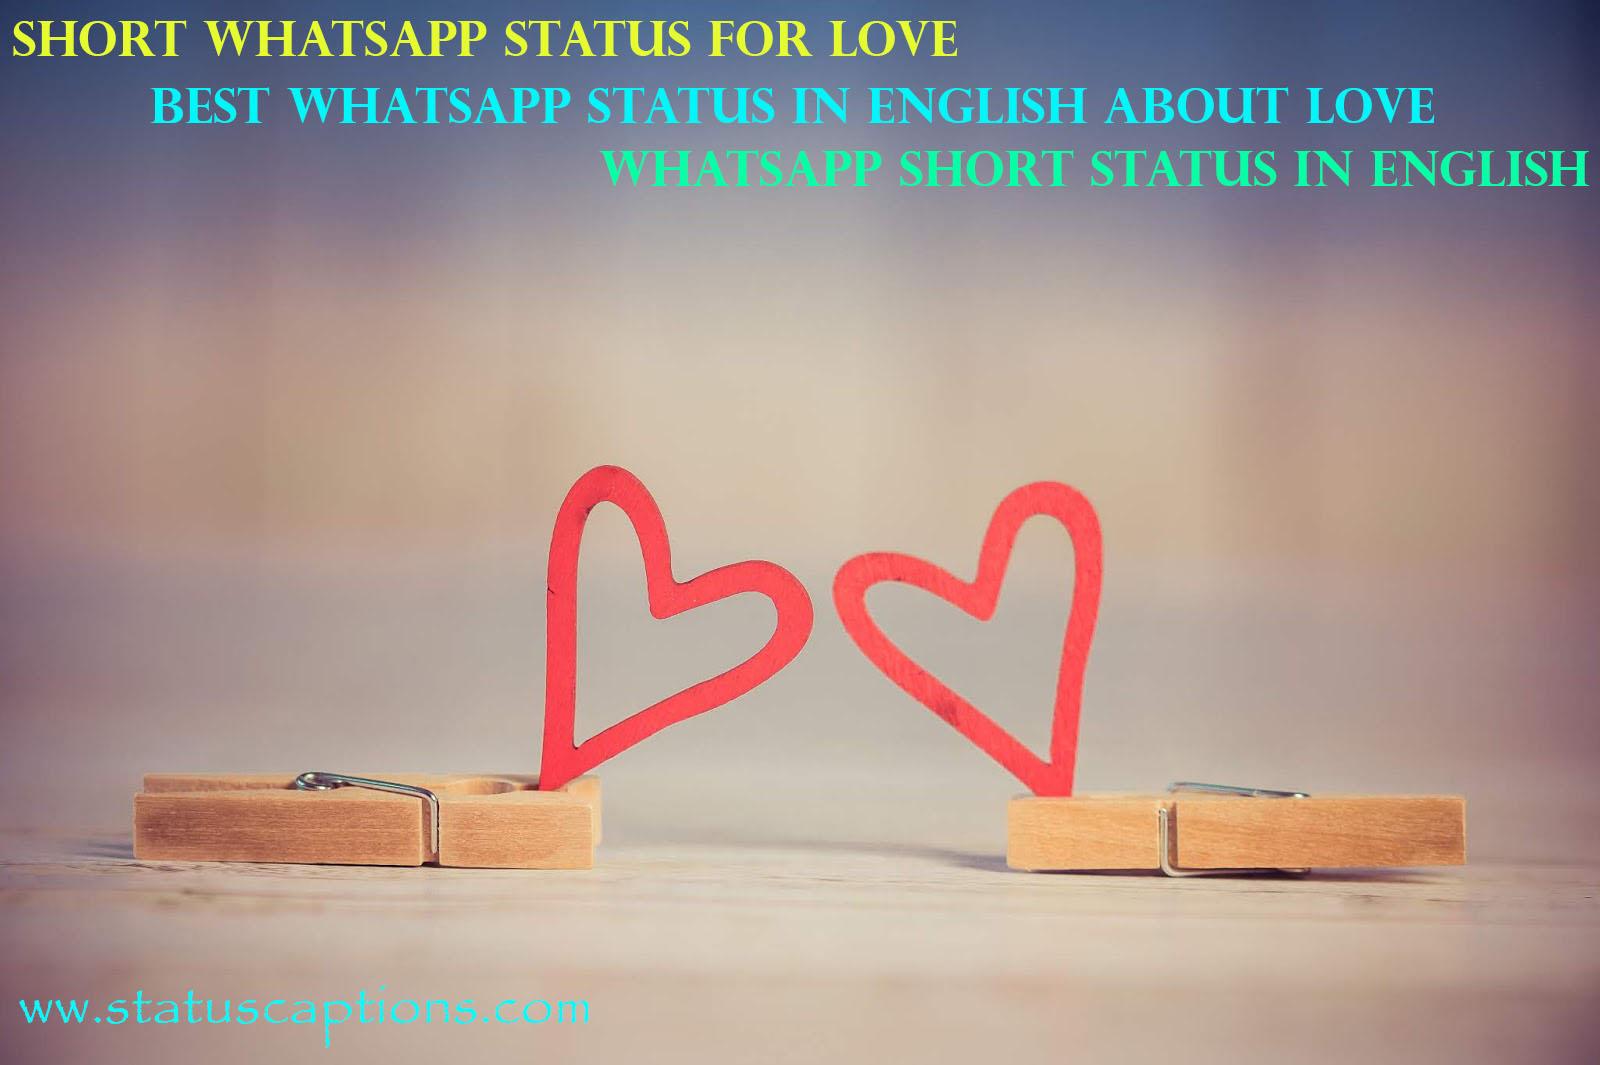 500+ Whatsapp Status Love in English Urdu Hindi Punjabi with